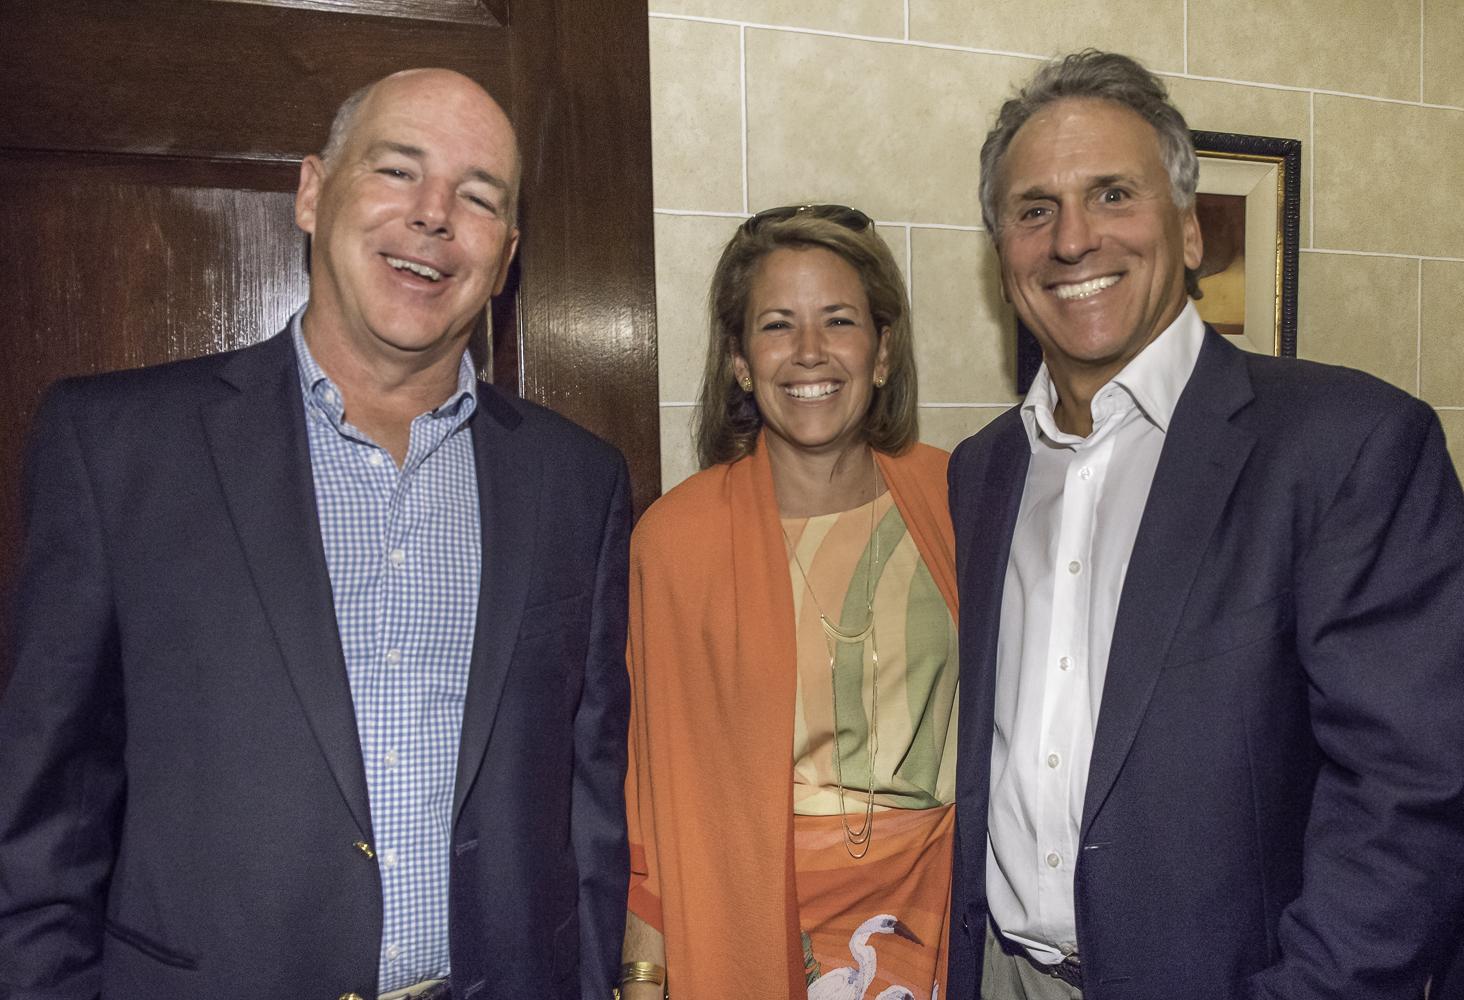 Peter and Lisa Lane, Rick Goldsmith